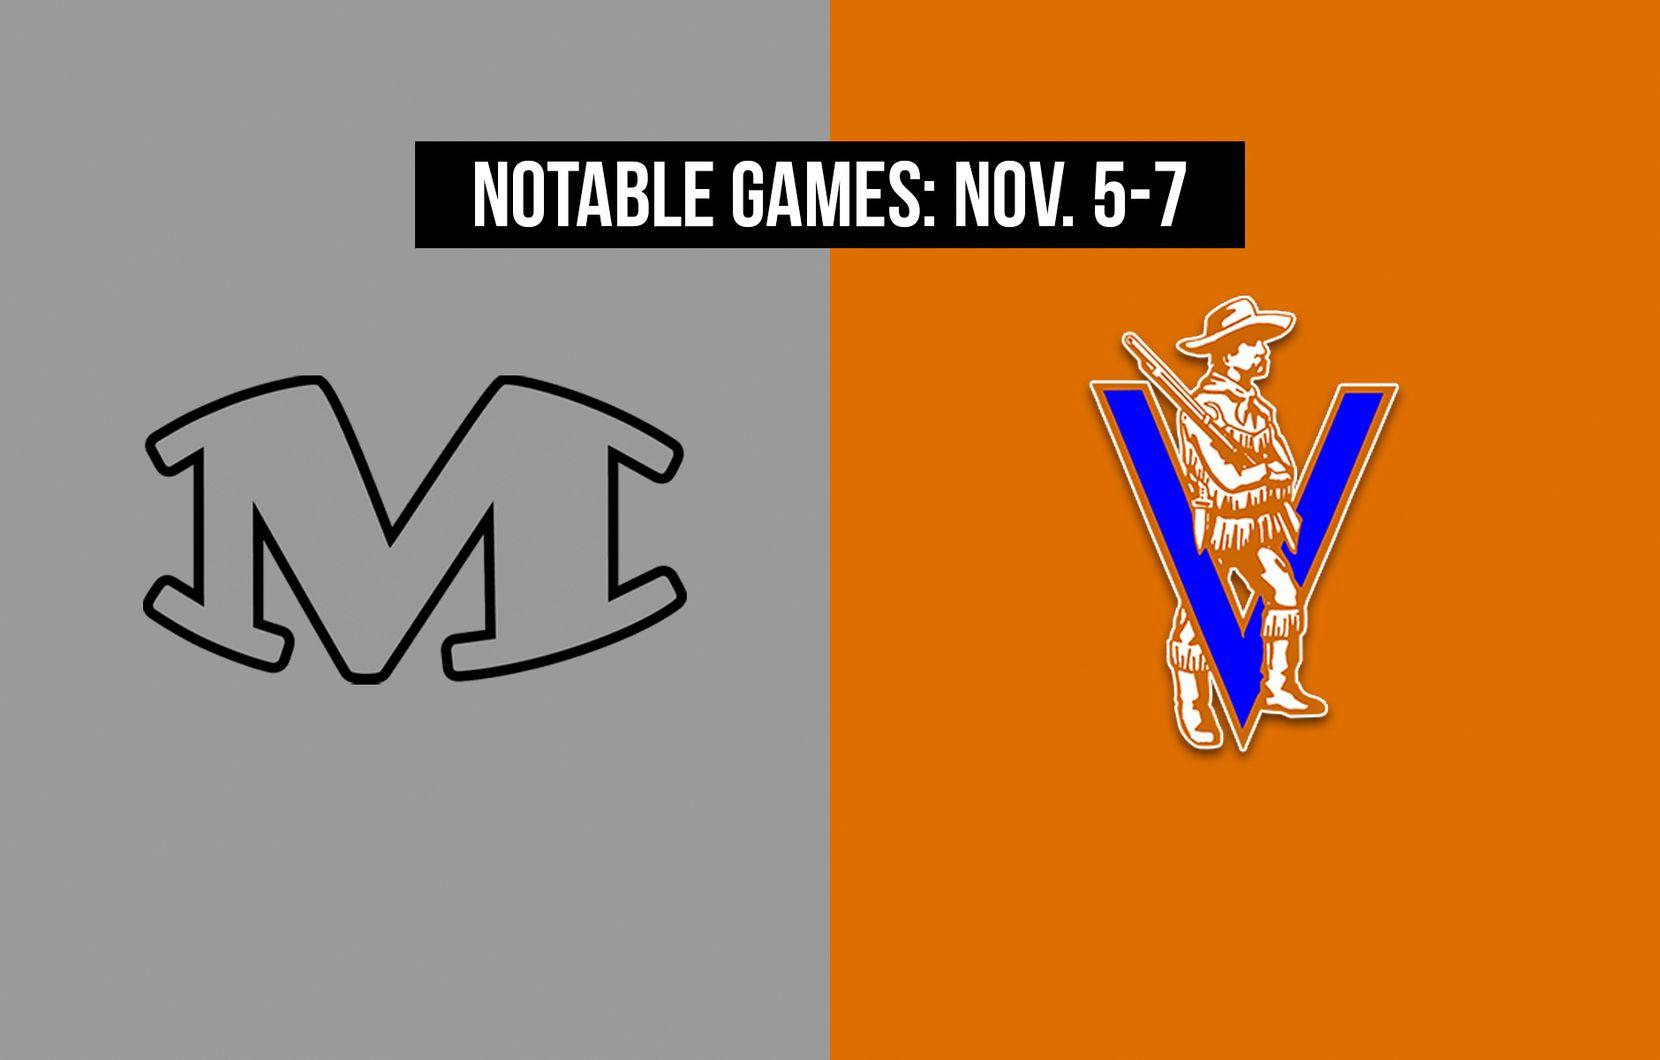 Notable games for the week of Nov. 5-7 of the 2020 season: Arlington Martin vs. Arlington Bowie.